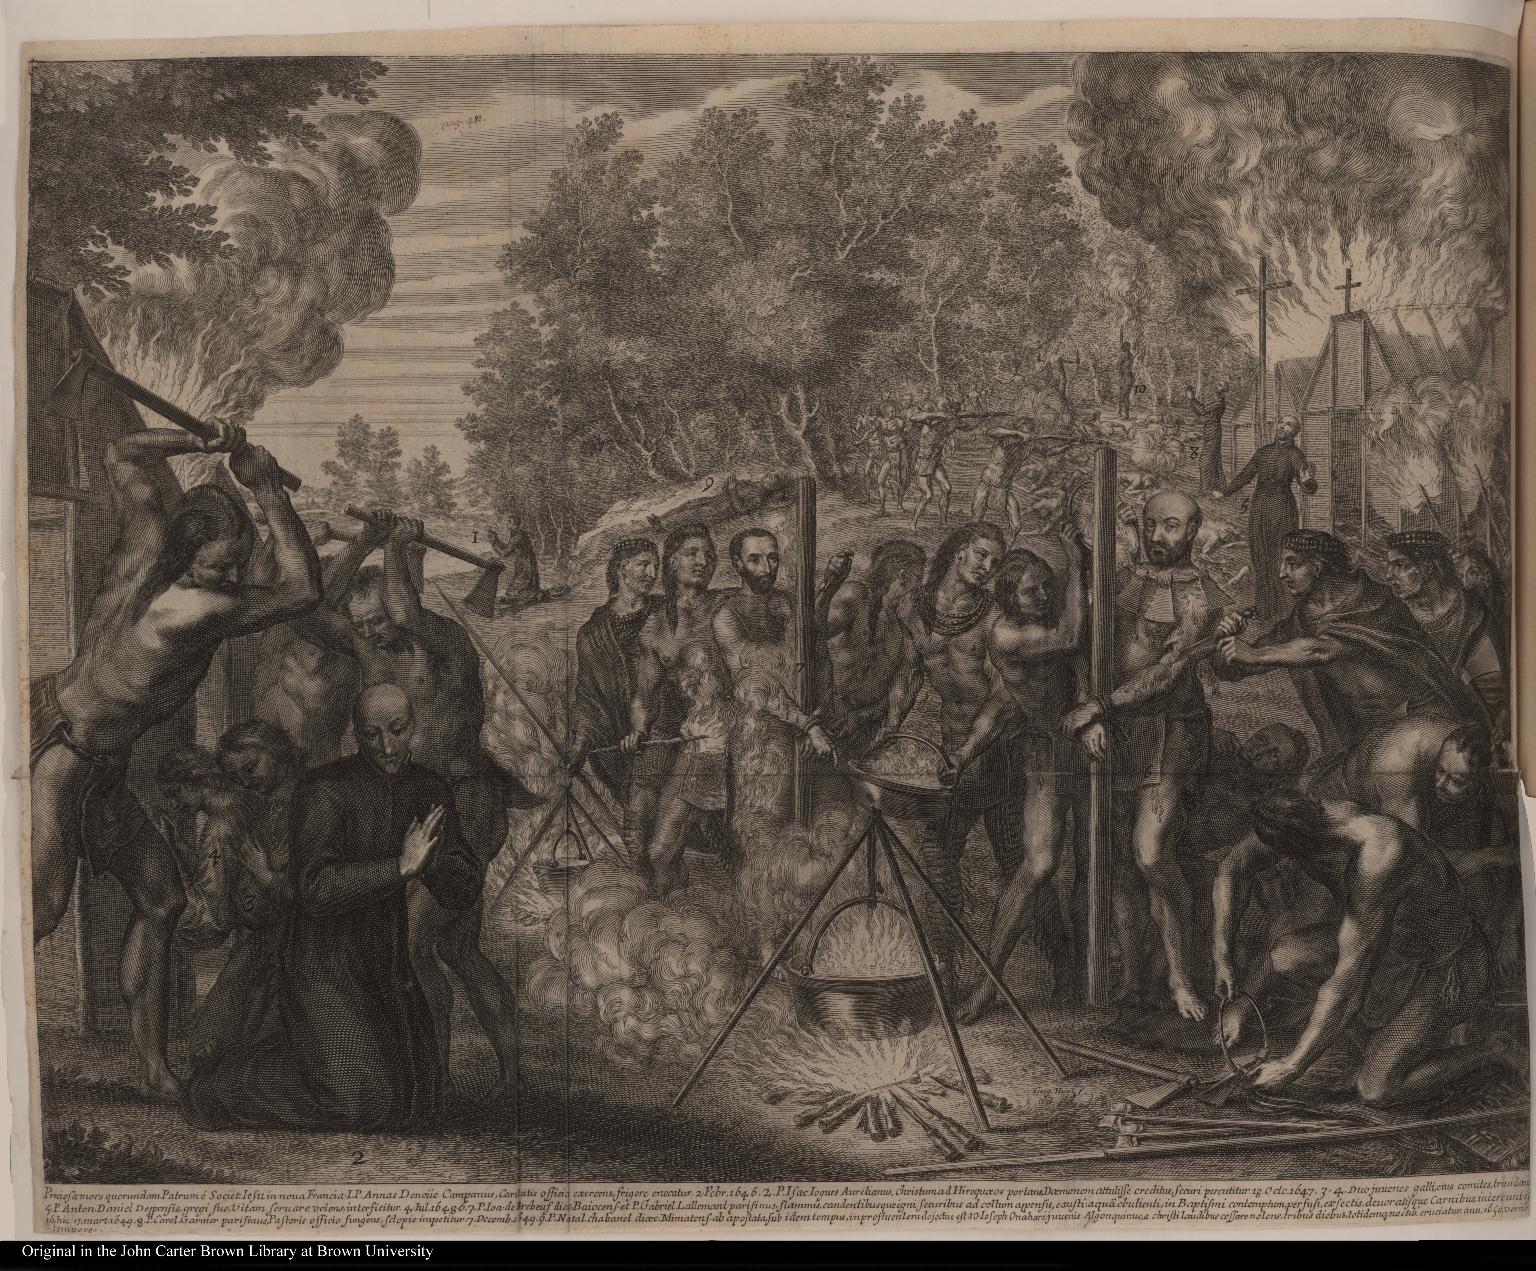 Preciosa mors quorundam Patrum iet. Iesu in nova Francia Denoiie Campanus, Caritas officia exercens enecatur. 2 Febr. 1646.